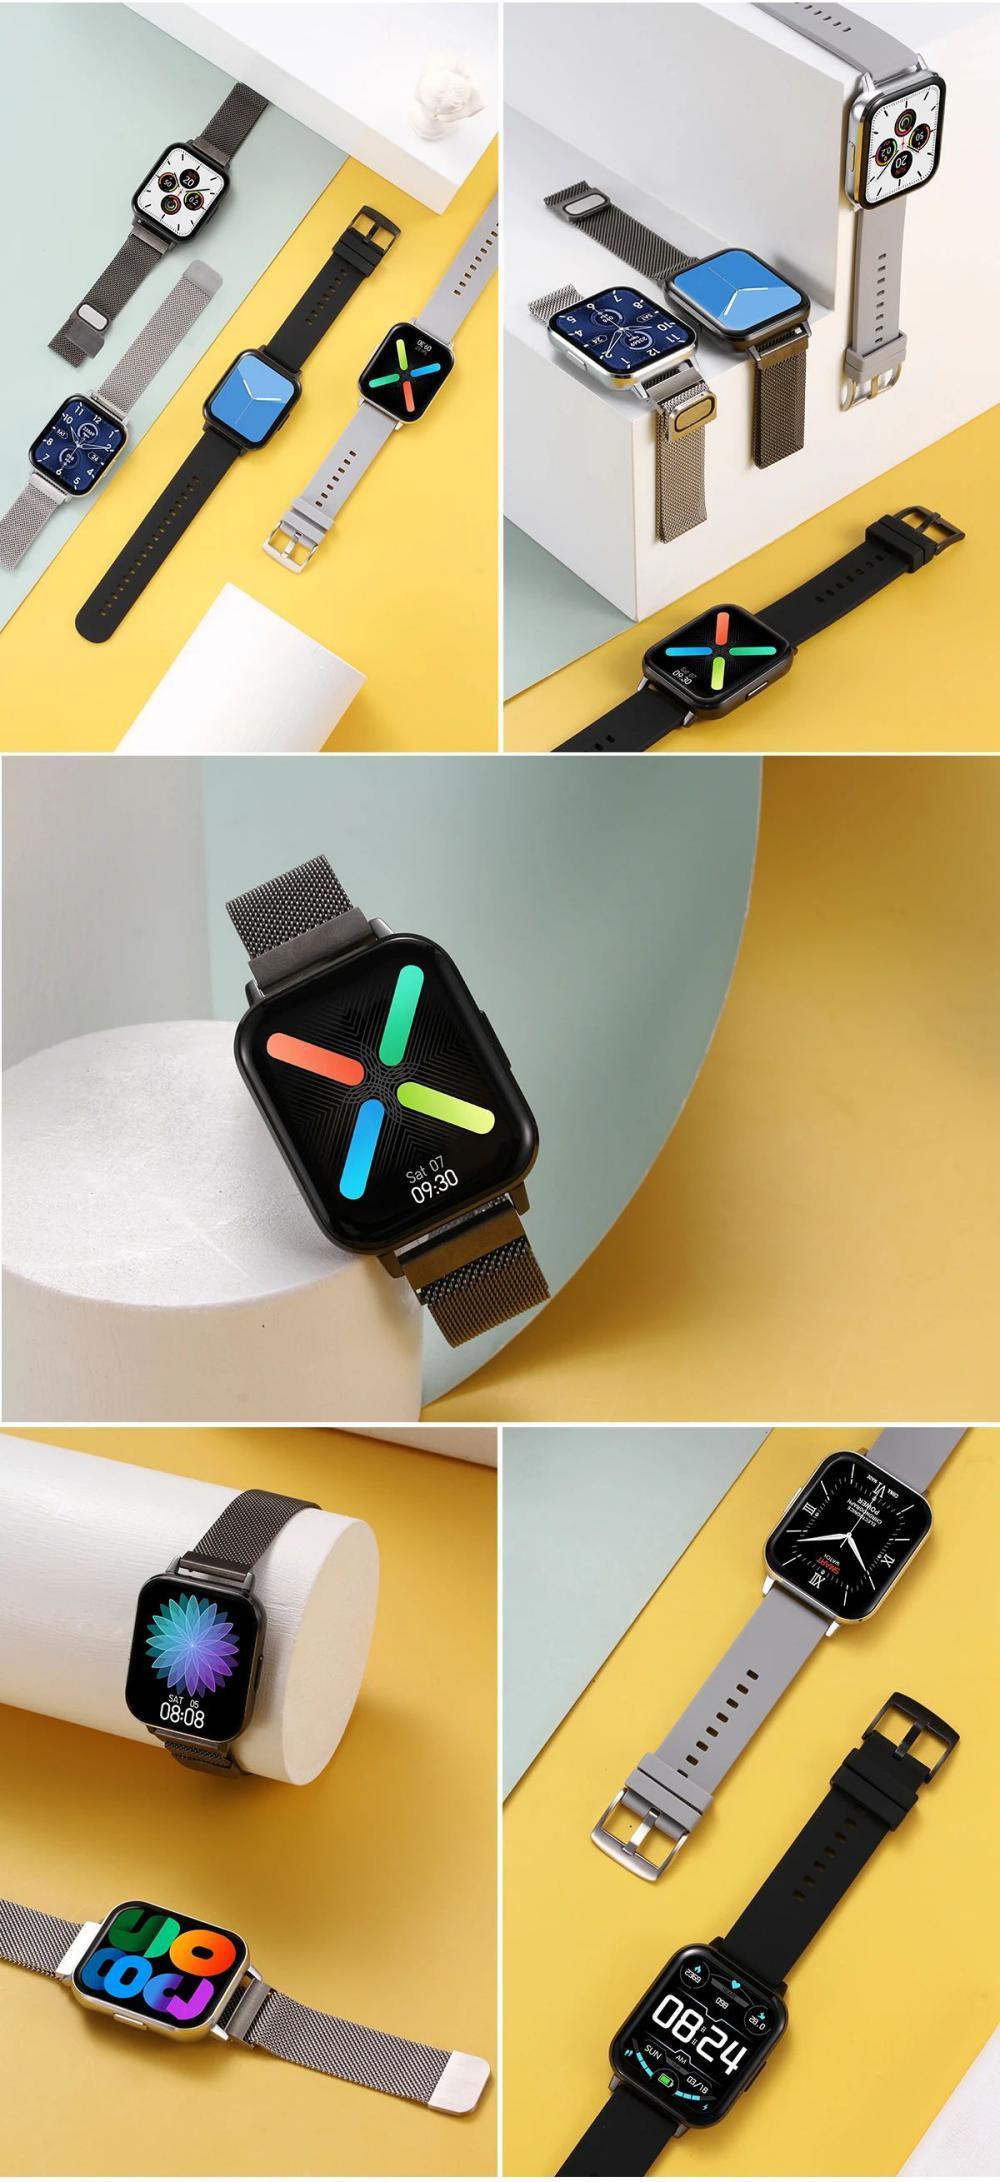 Dt No I Dt X Rectangular Full Display Smartwatch (7)